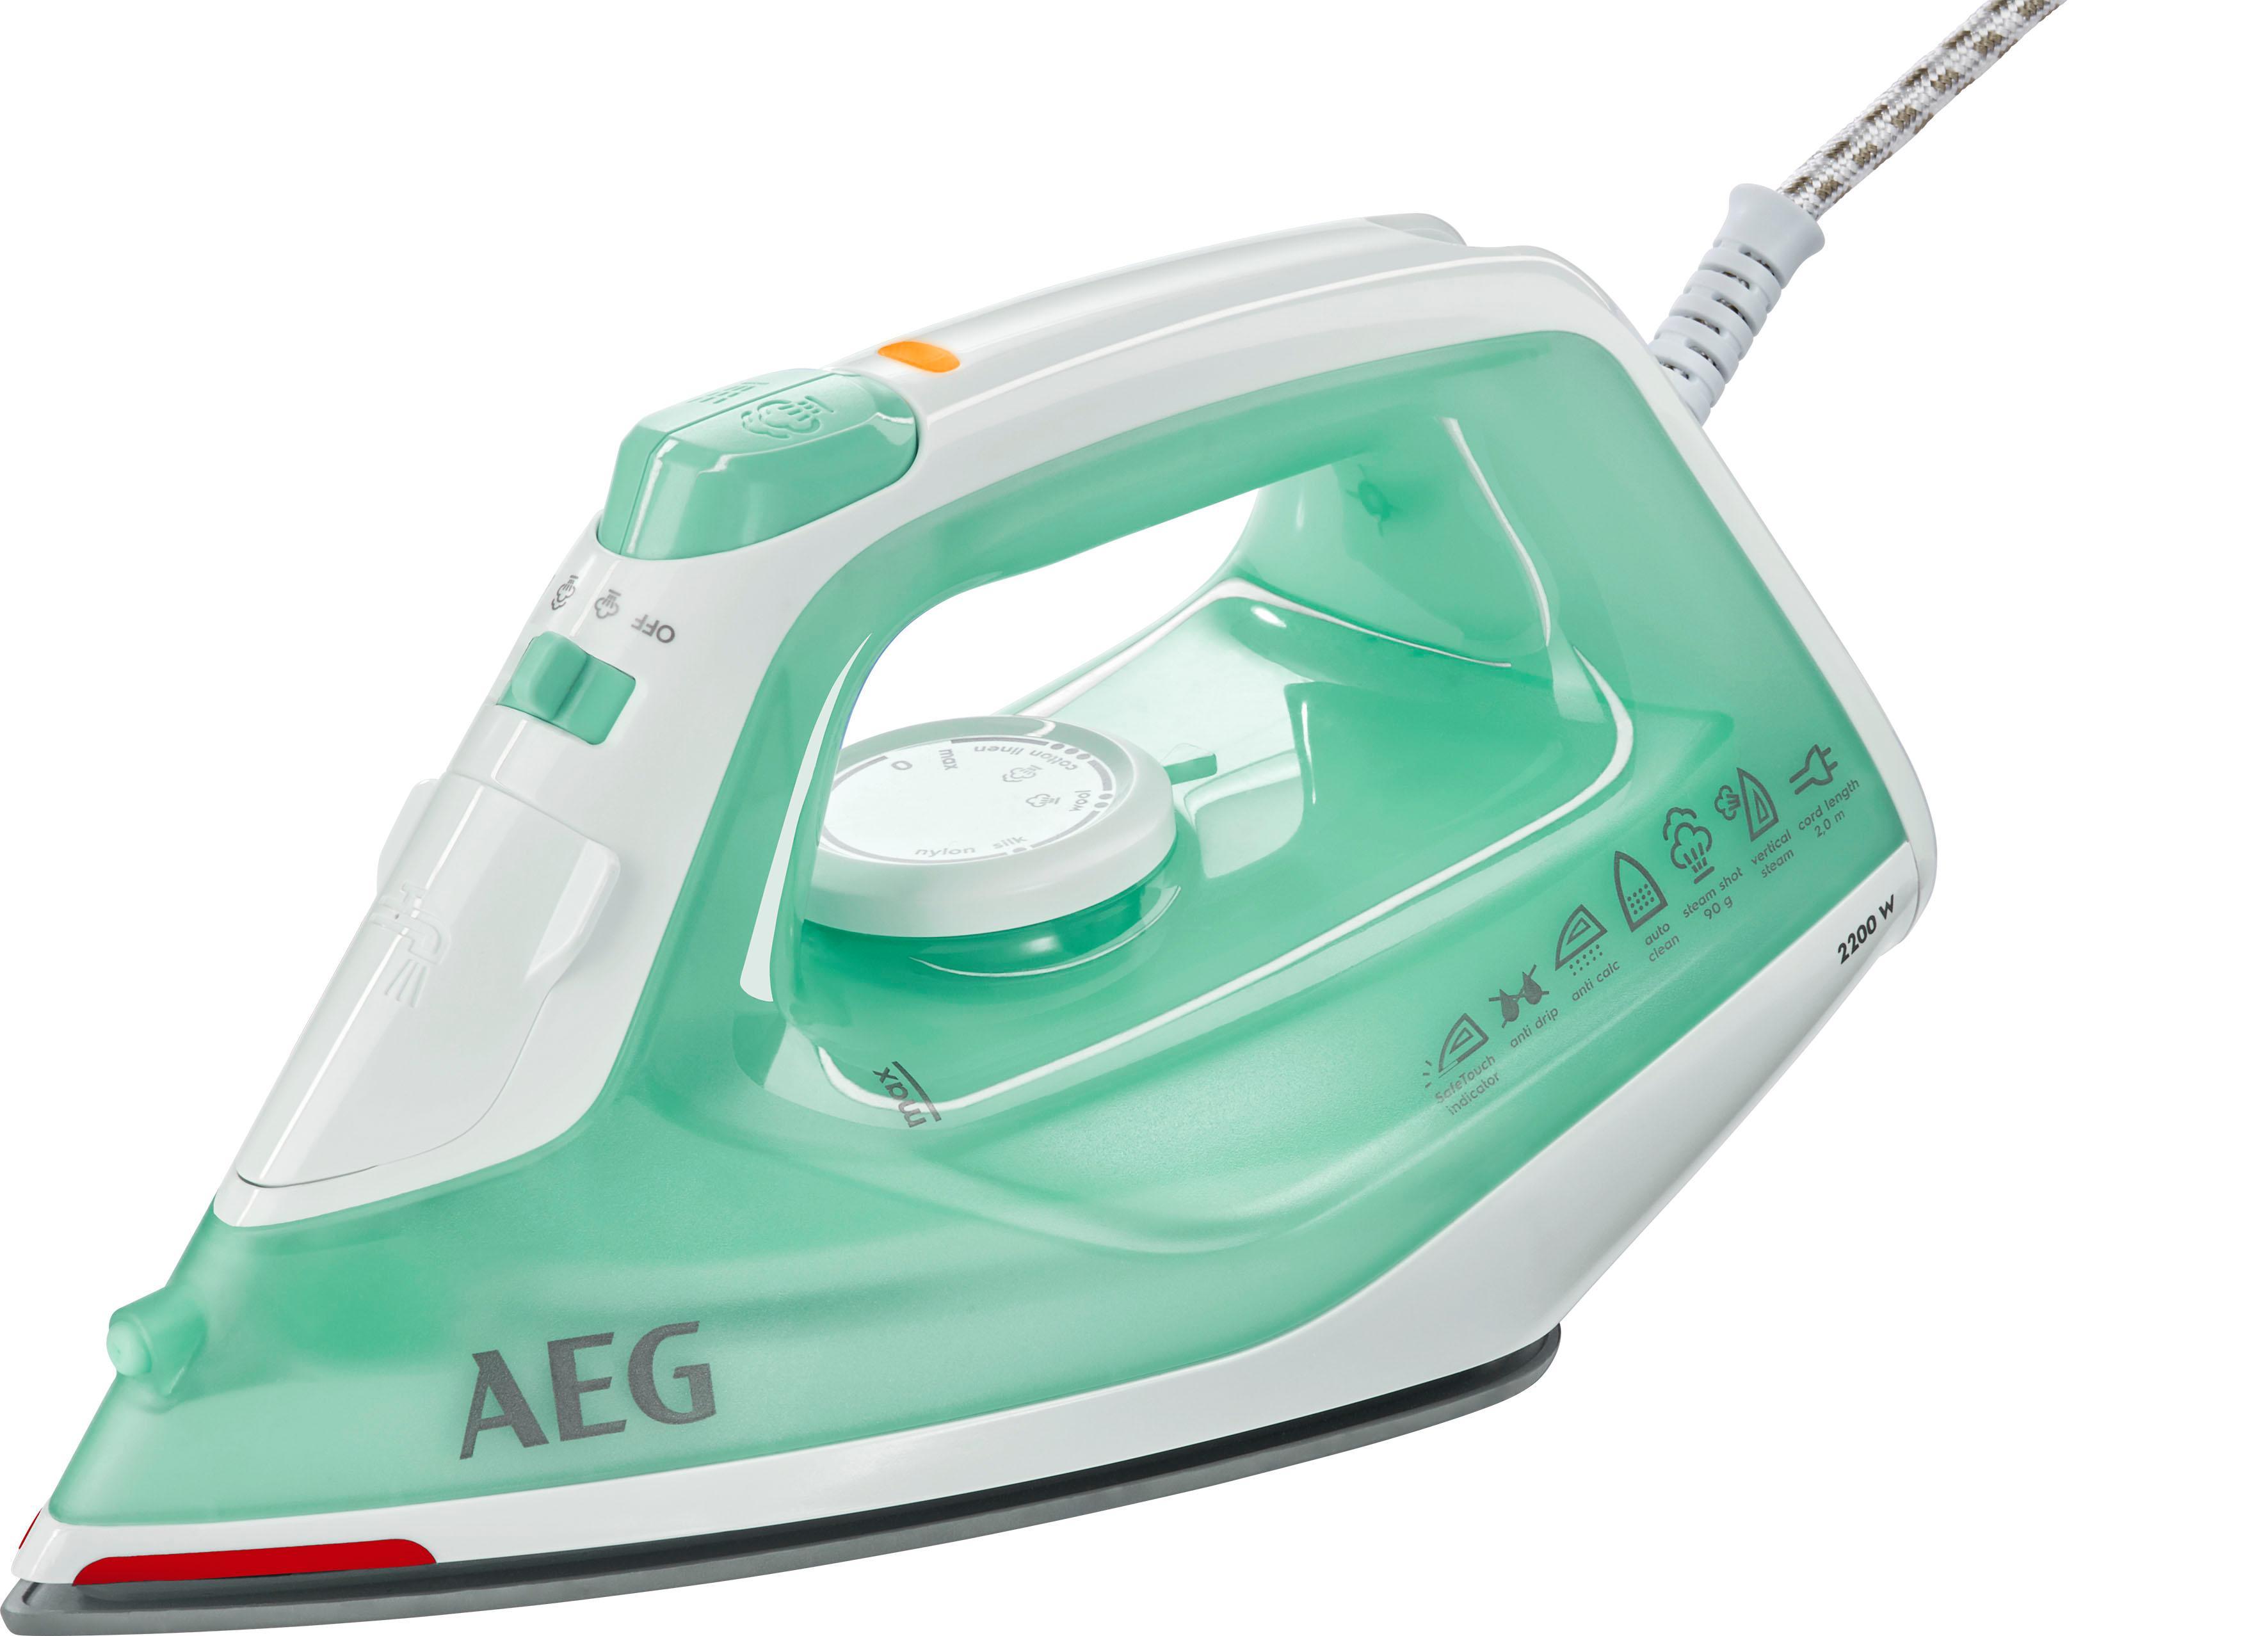 AEG Dampfbügeleisen EasyLine DB 1720, 2200 Watt | Flur & Diele > Haushaltsgeräte > Bügeleisen | Grün | AEG